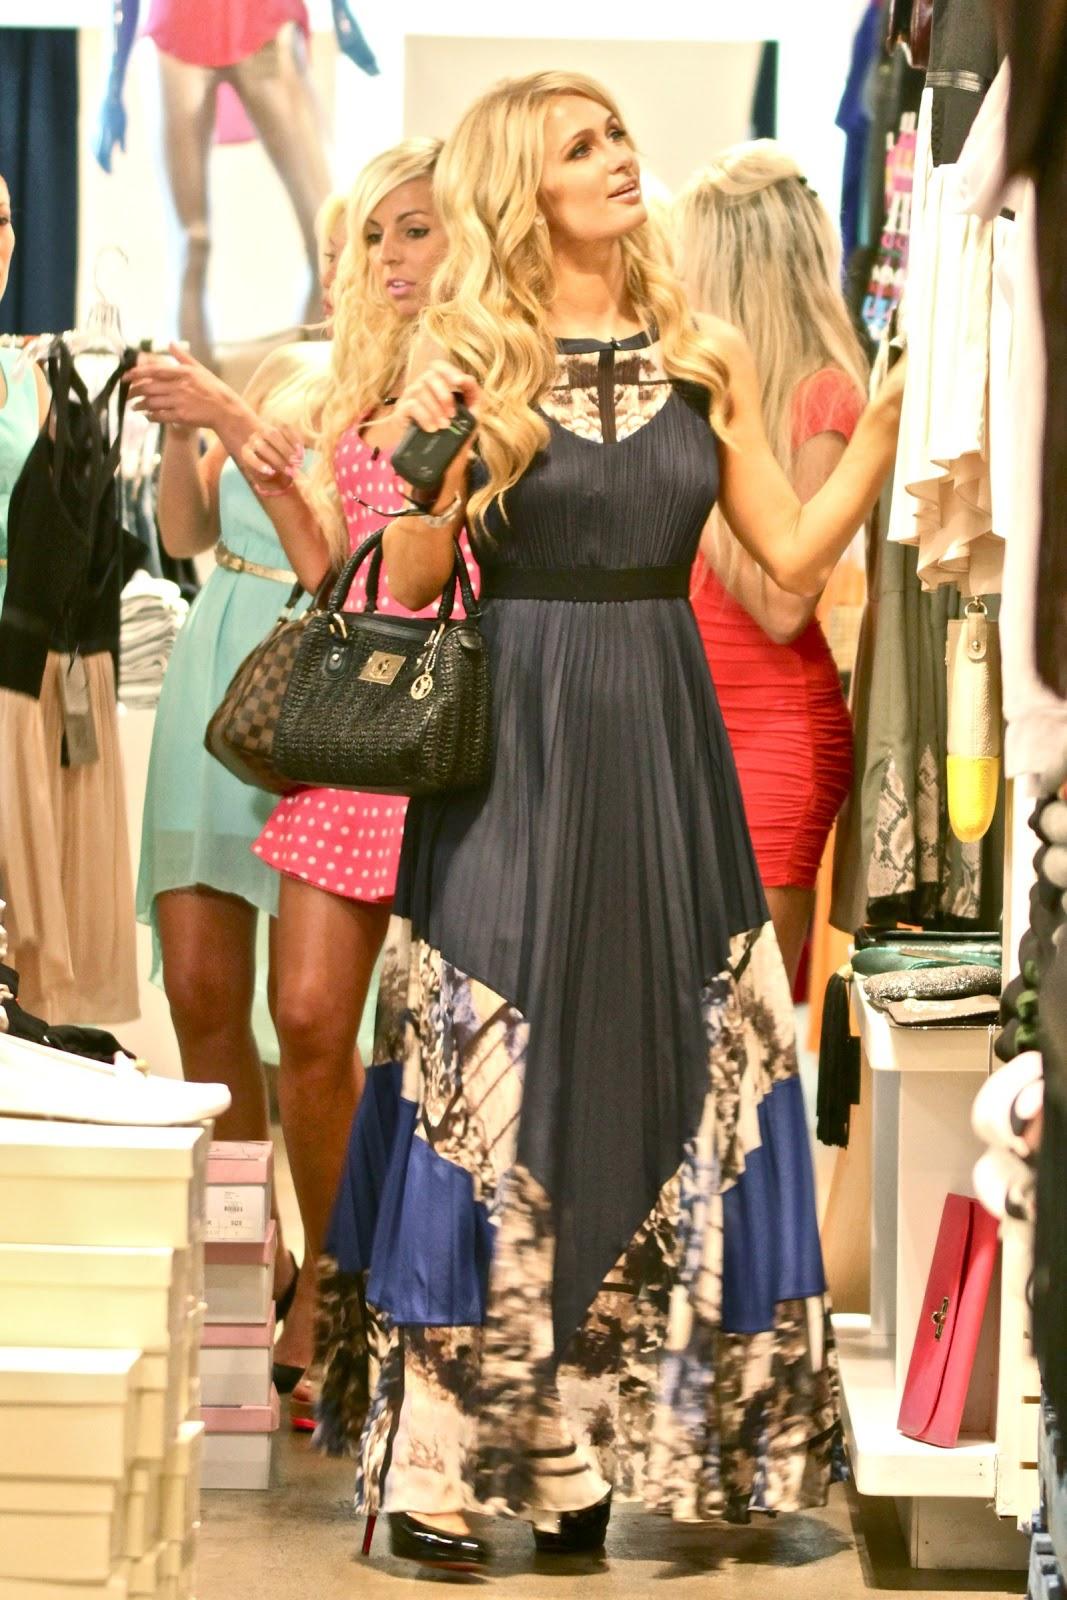 Candidshotcelebrity: Paris Hilton - Braless Candids in Los